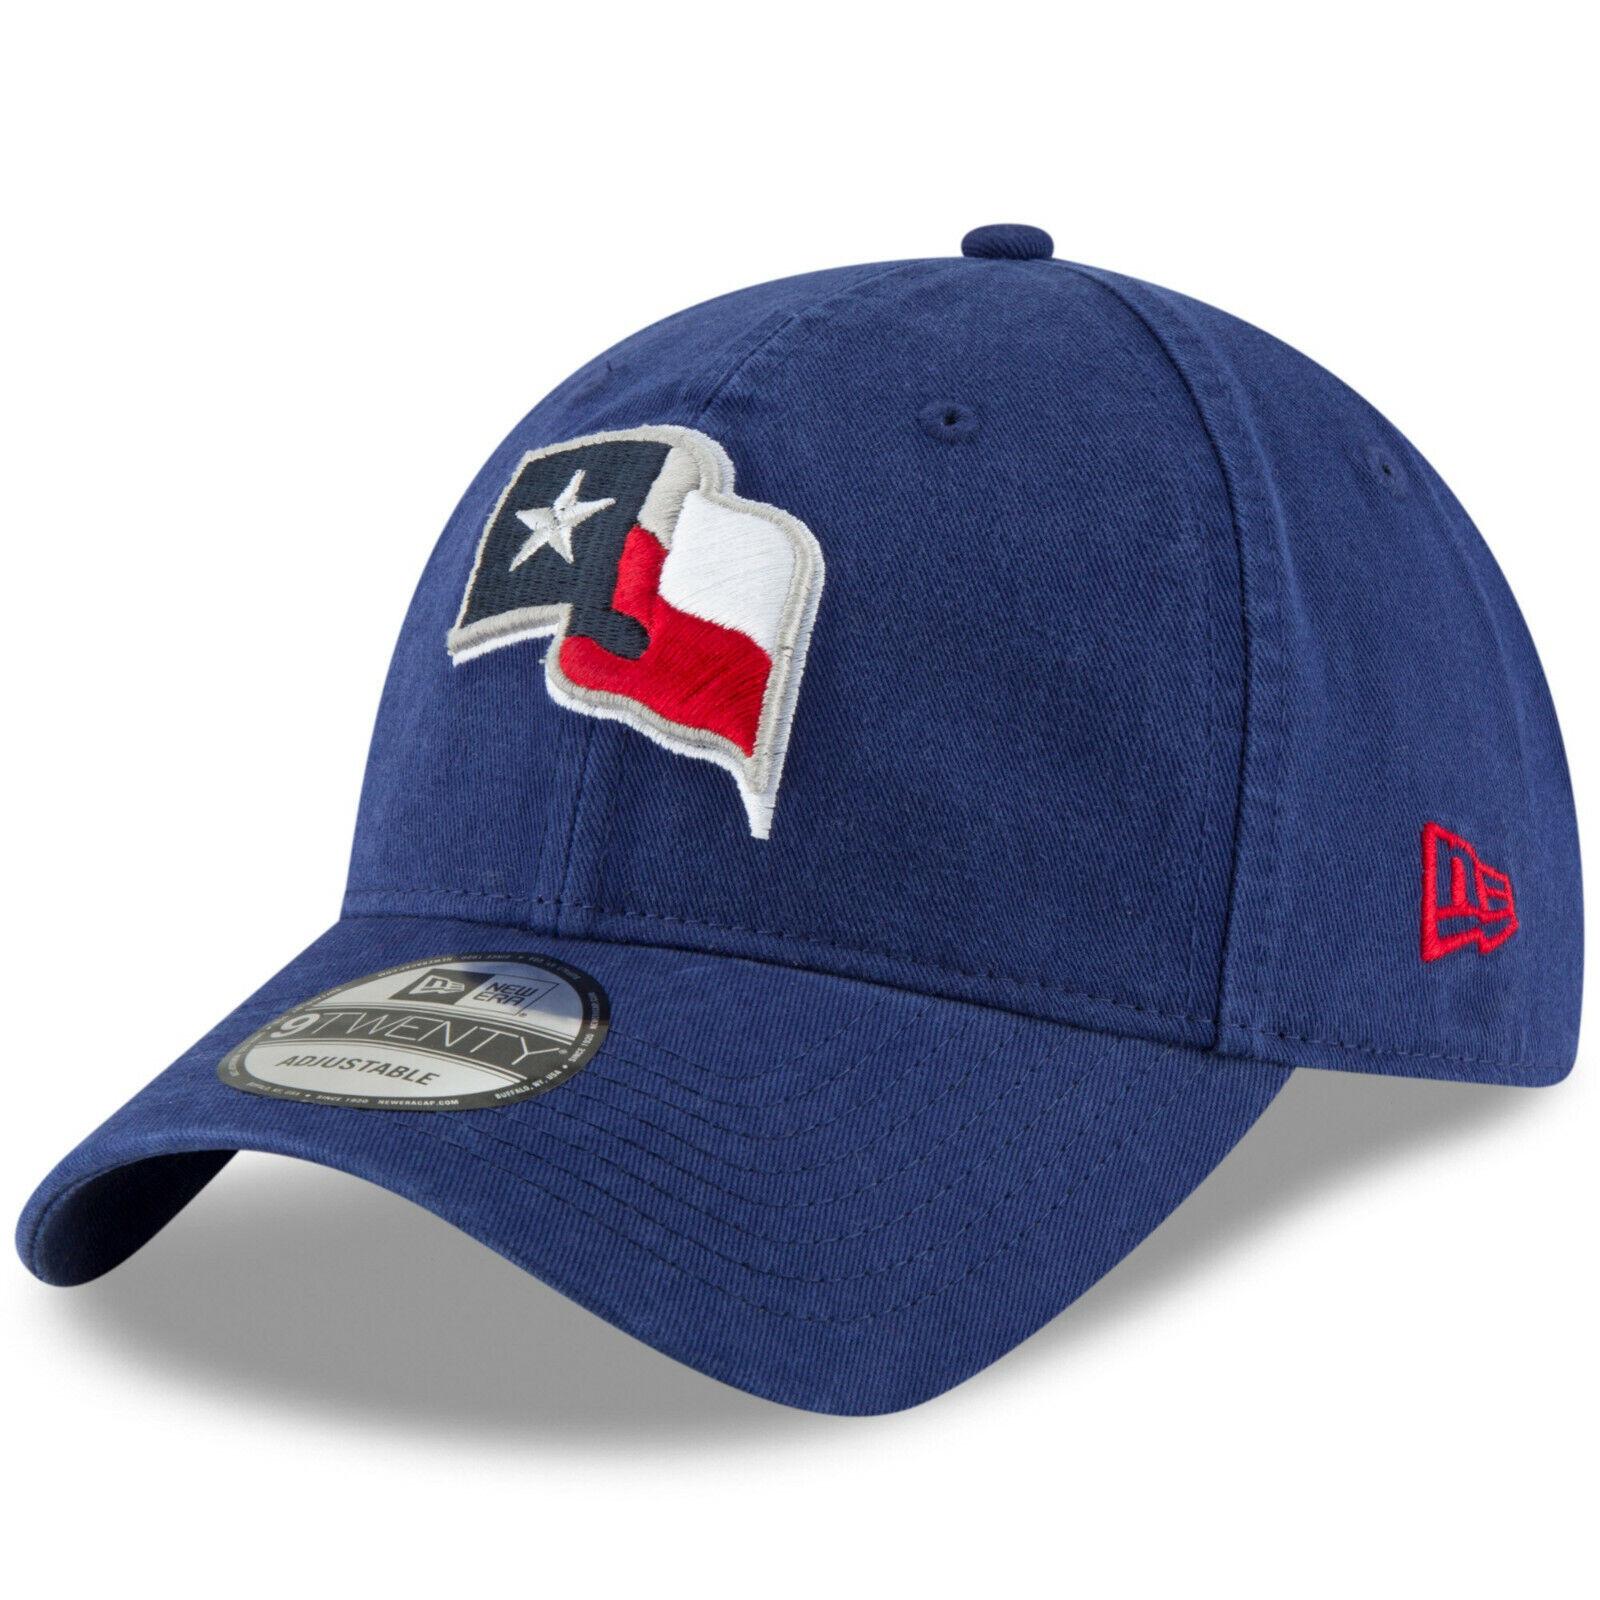 Texas Rangers New Era Core Classic 9TWENTY Adjustable Hat -